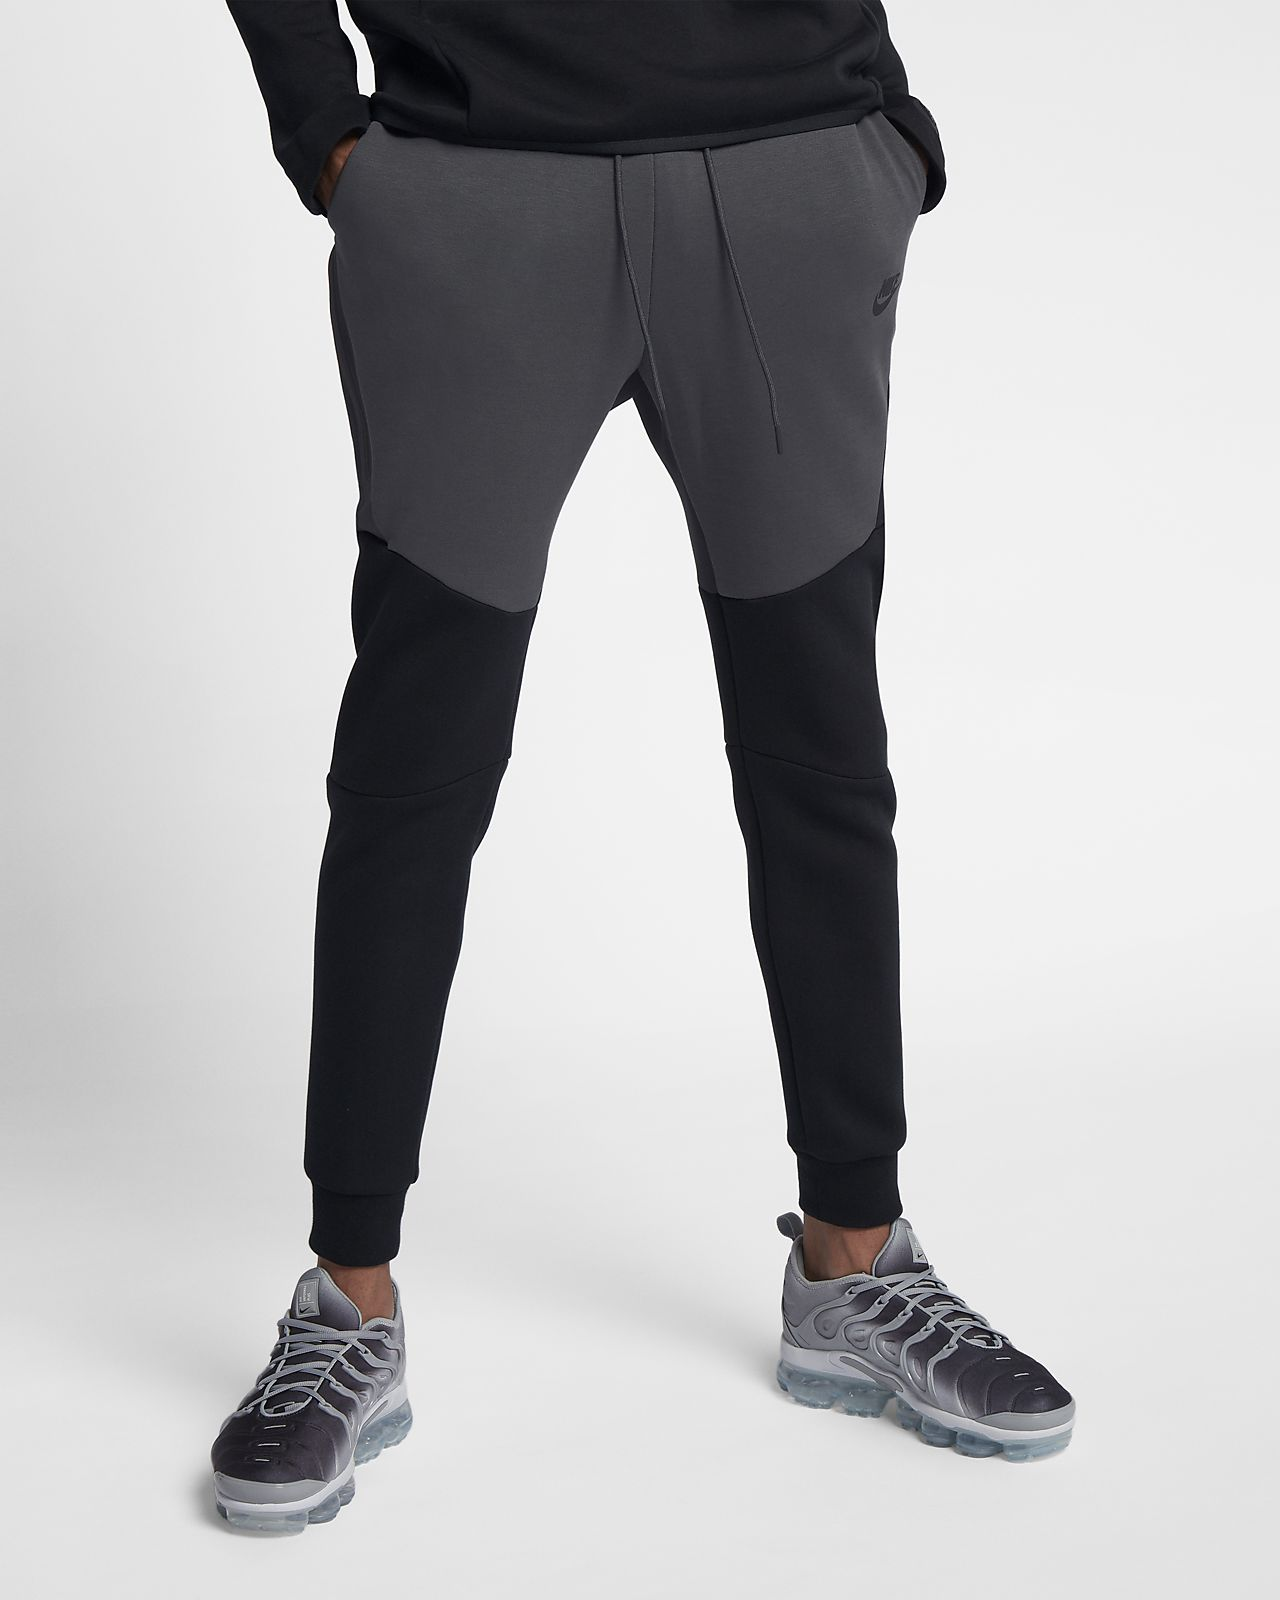 Pantalones deportivos para hombre Nike Sportswear Tech Fleece. Nike ... d78c02df25dc0